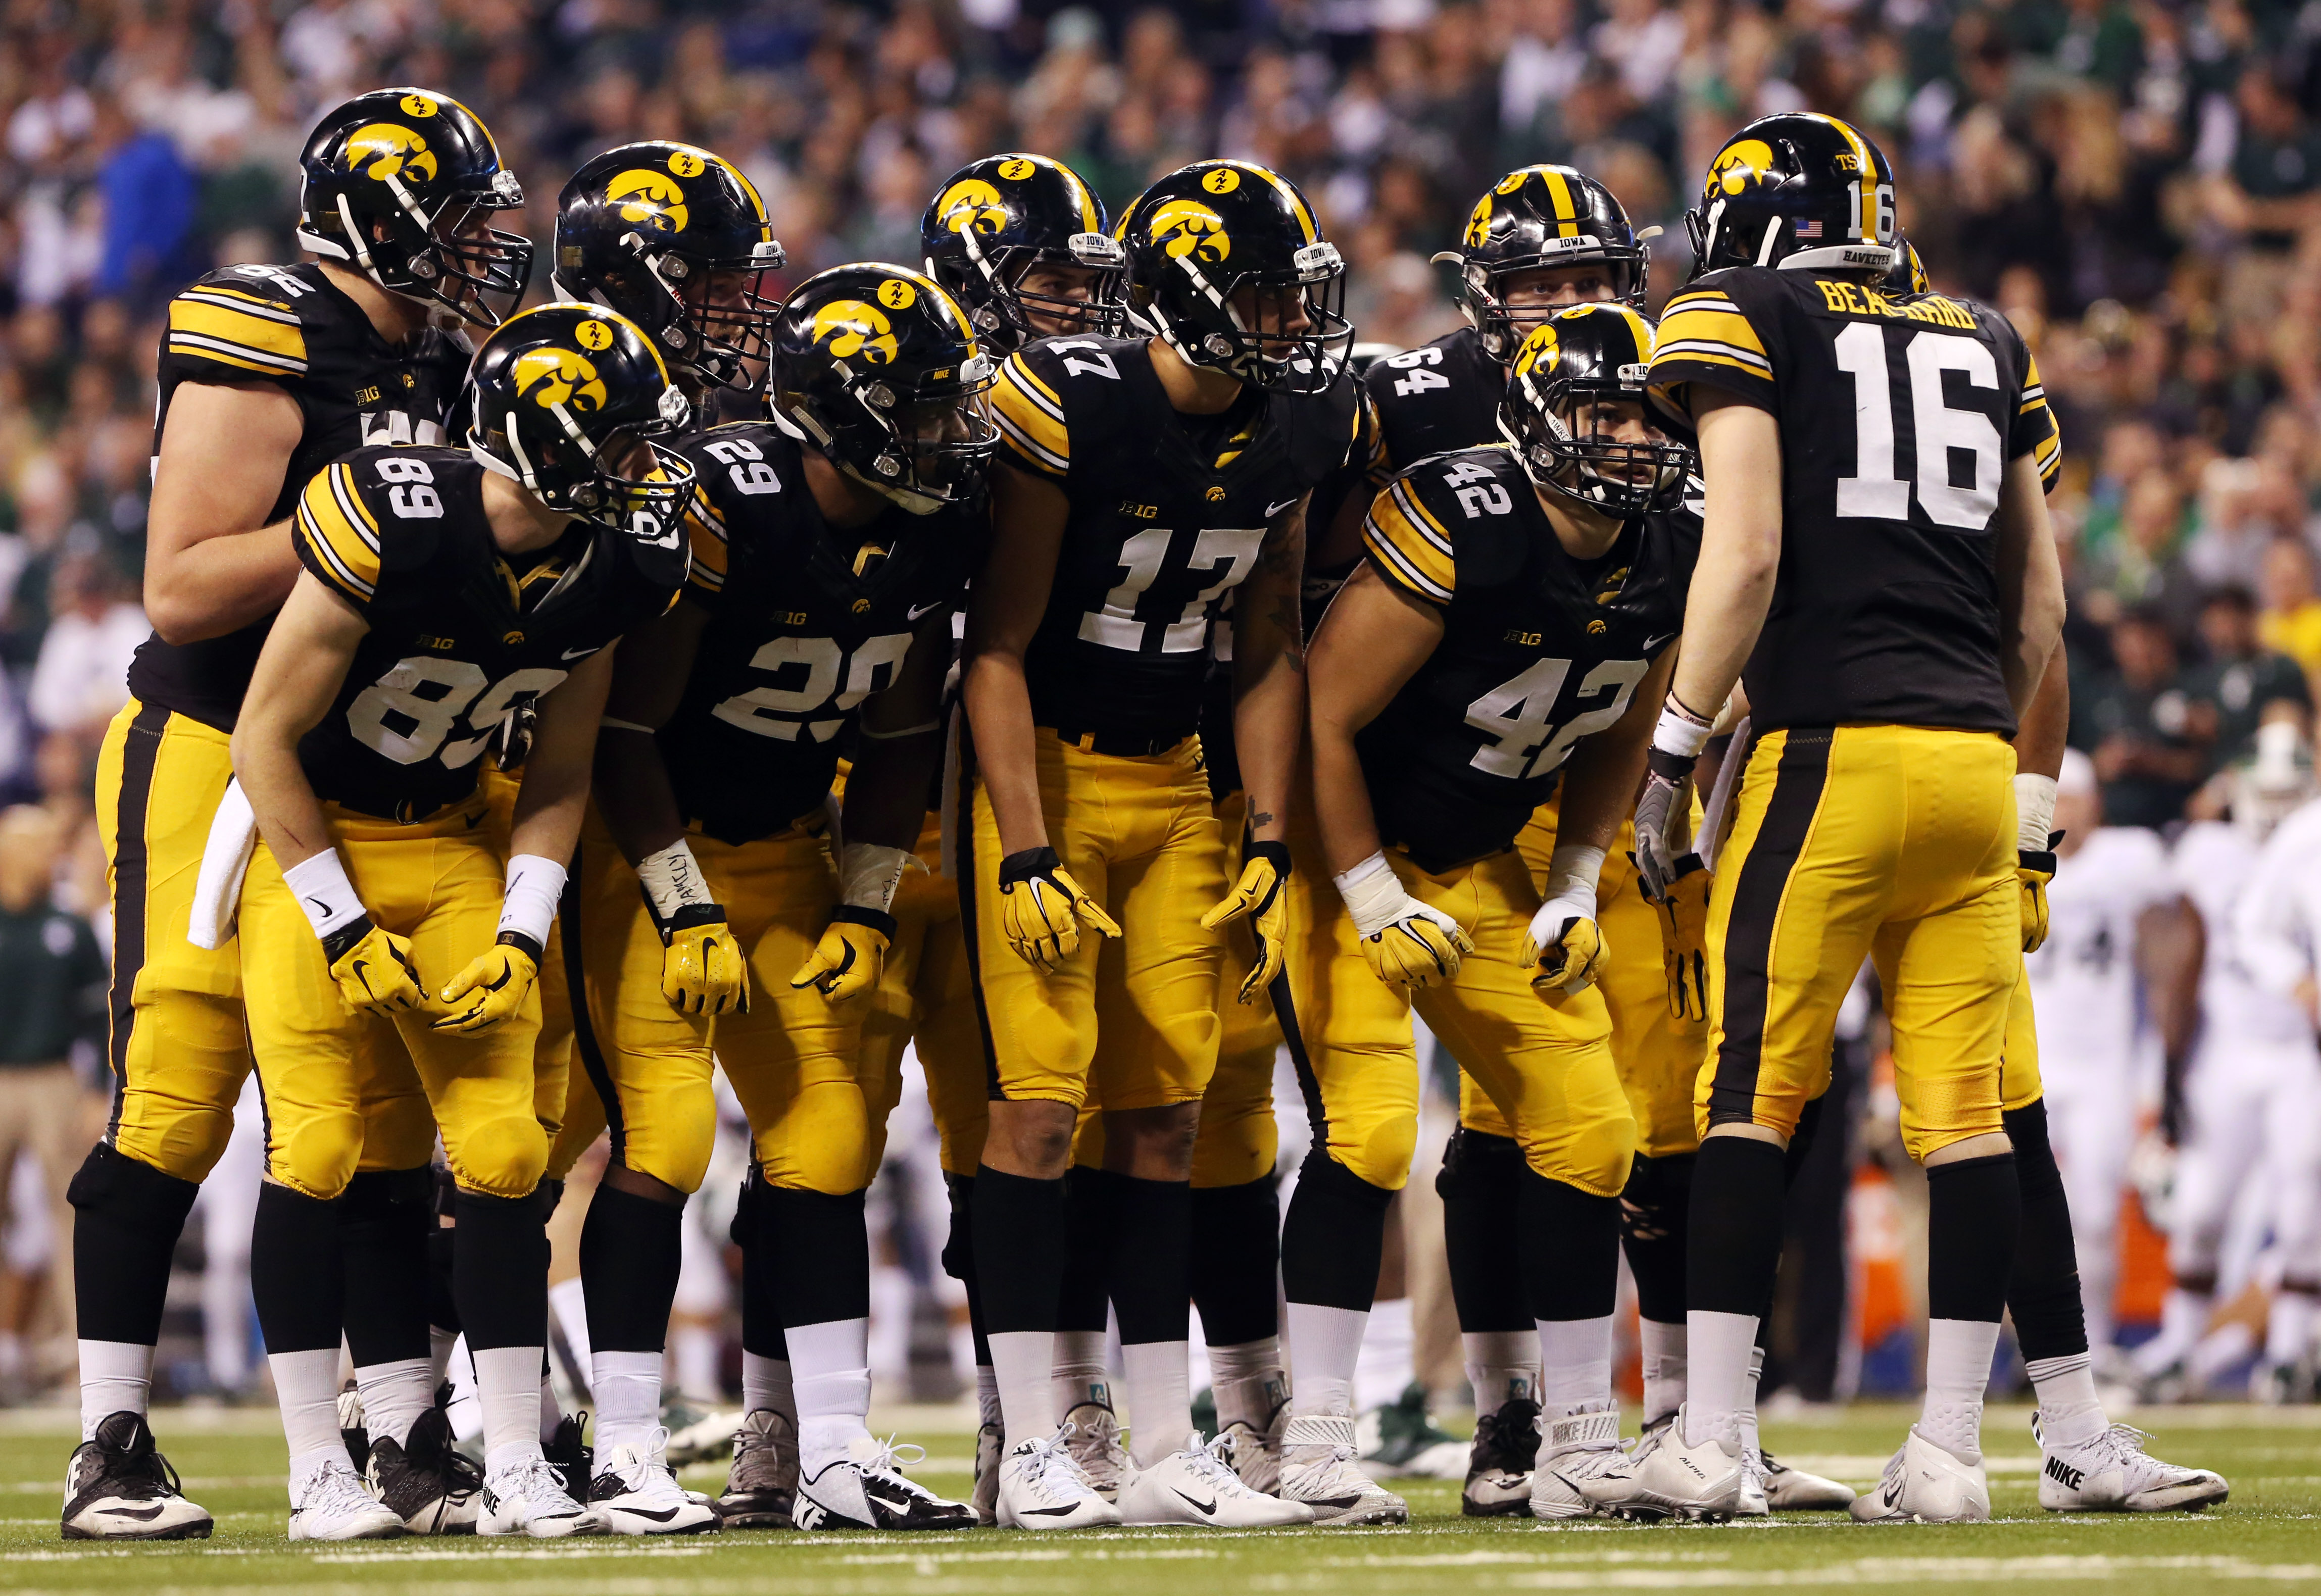 NCAA Football: Big Ten Championship-Iowa vs Michigan State